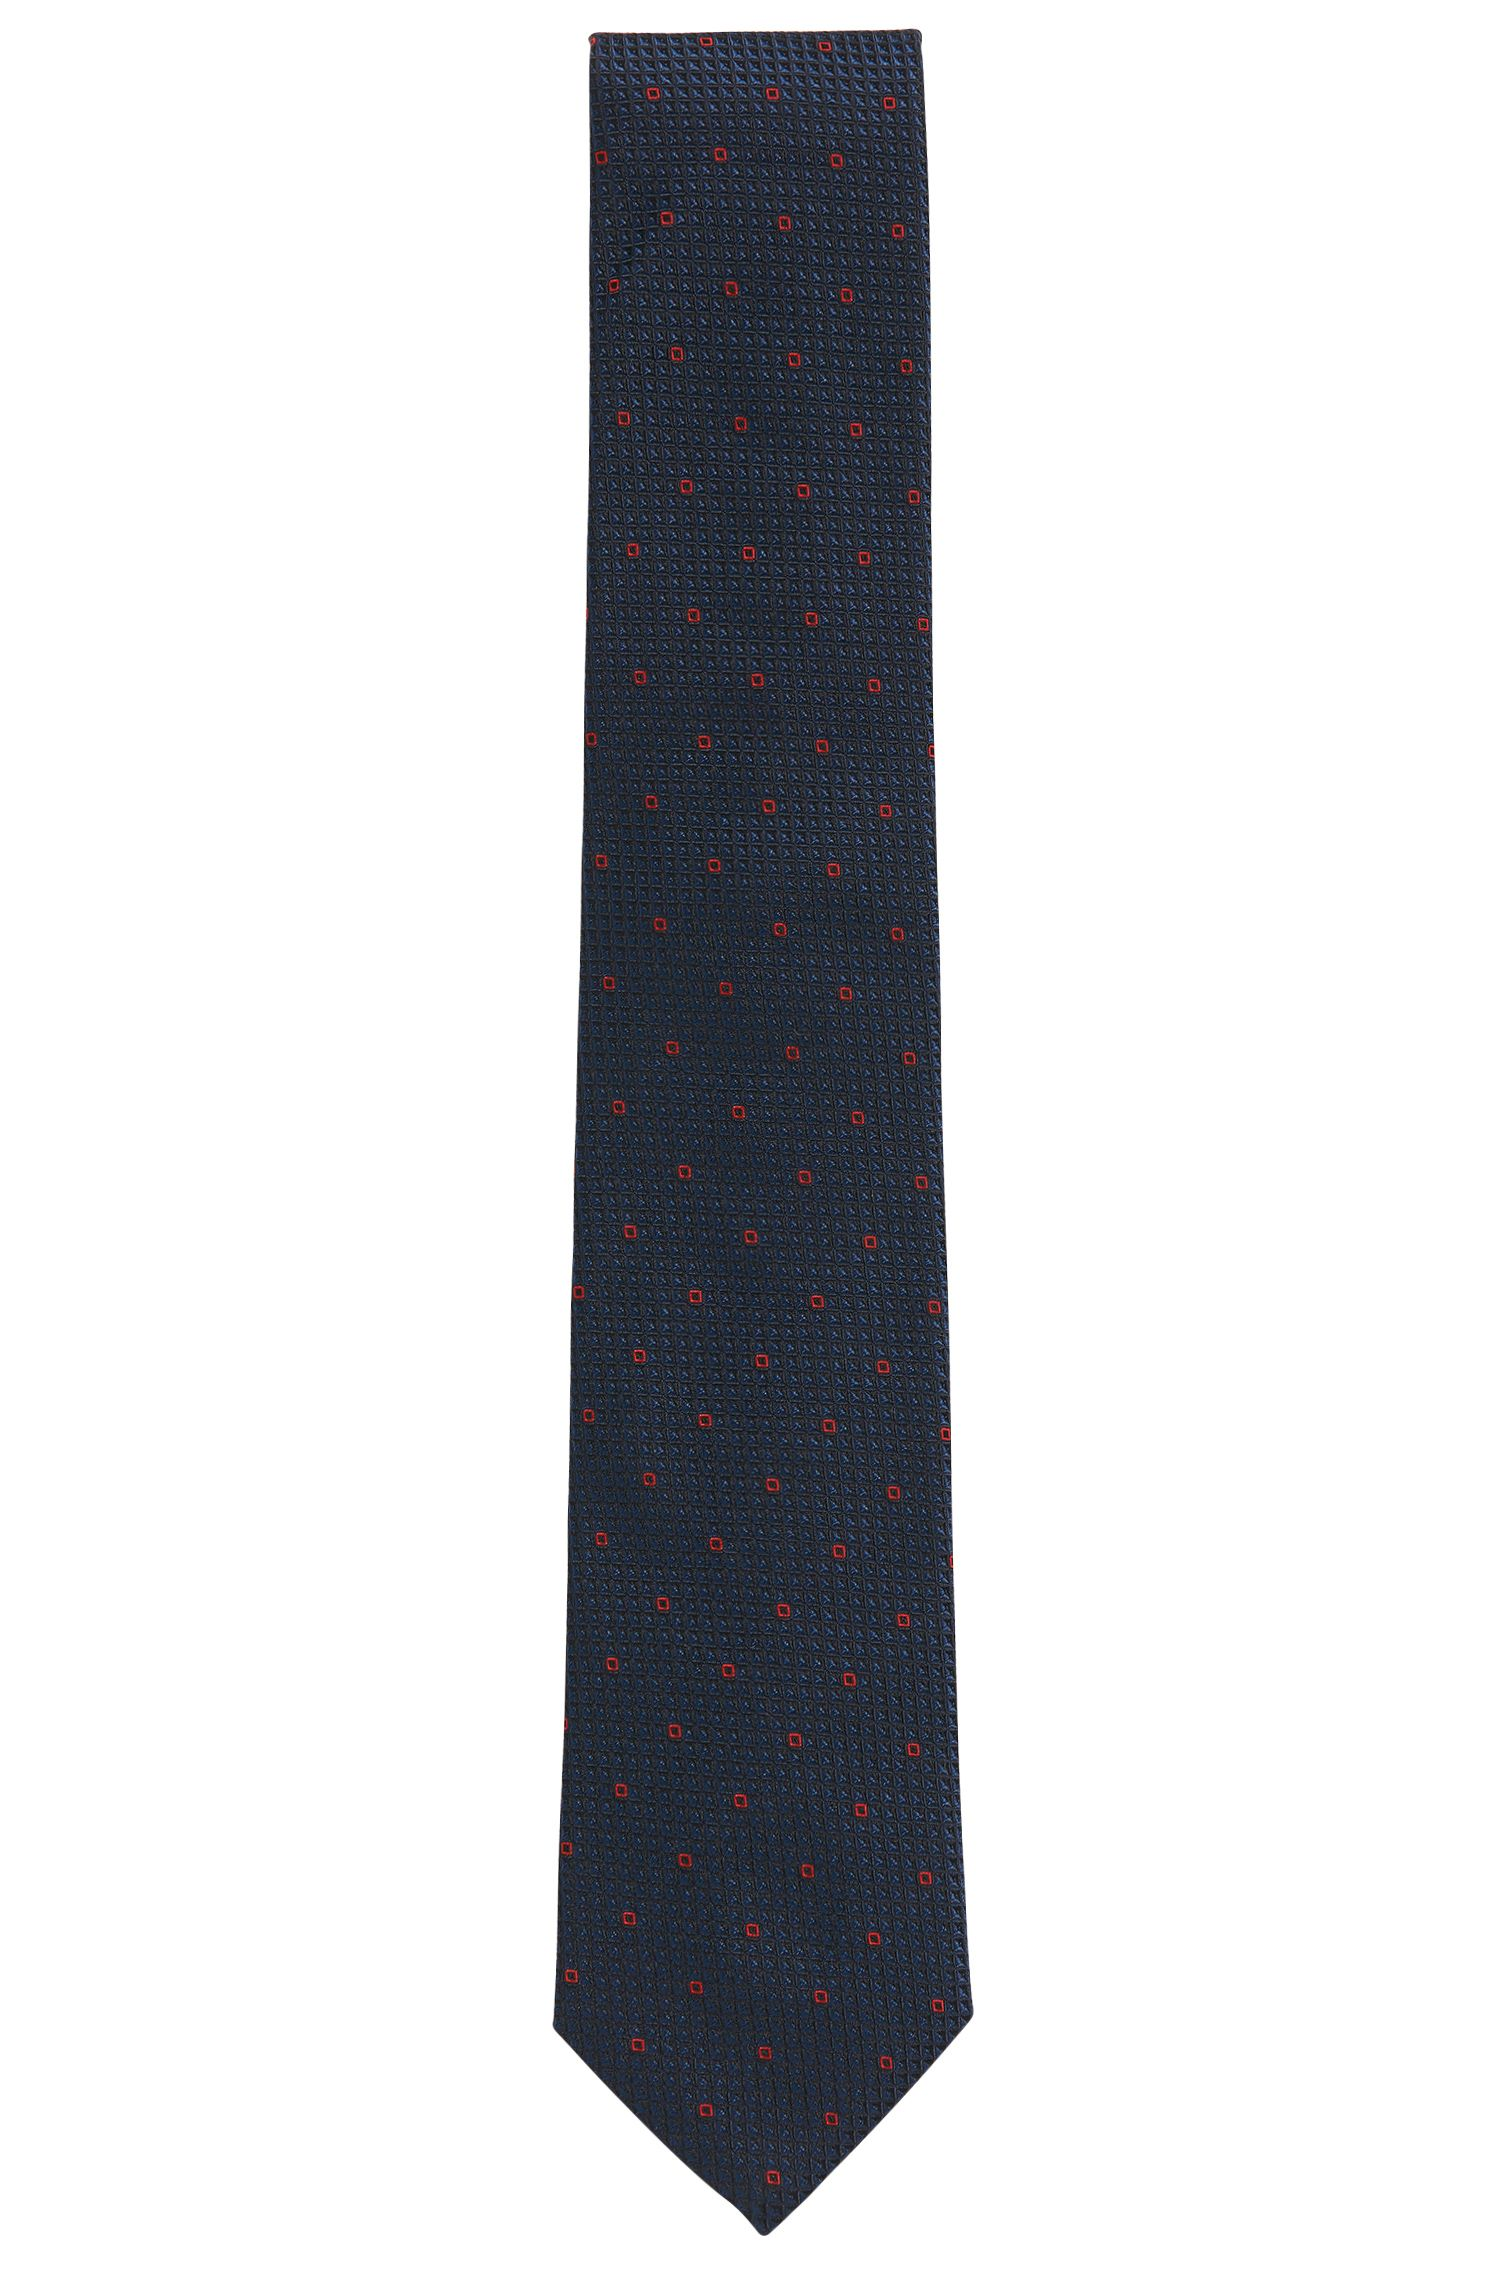 'Tie 7.5 cm' | Regular, Textured Silk Tie